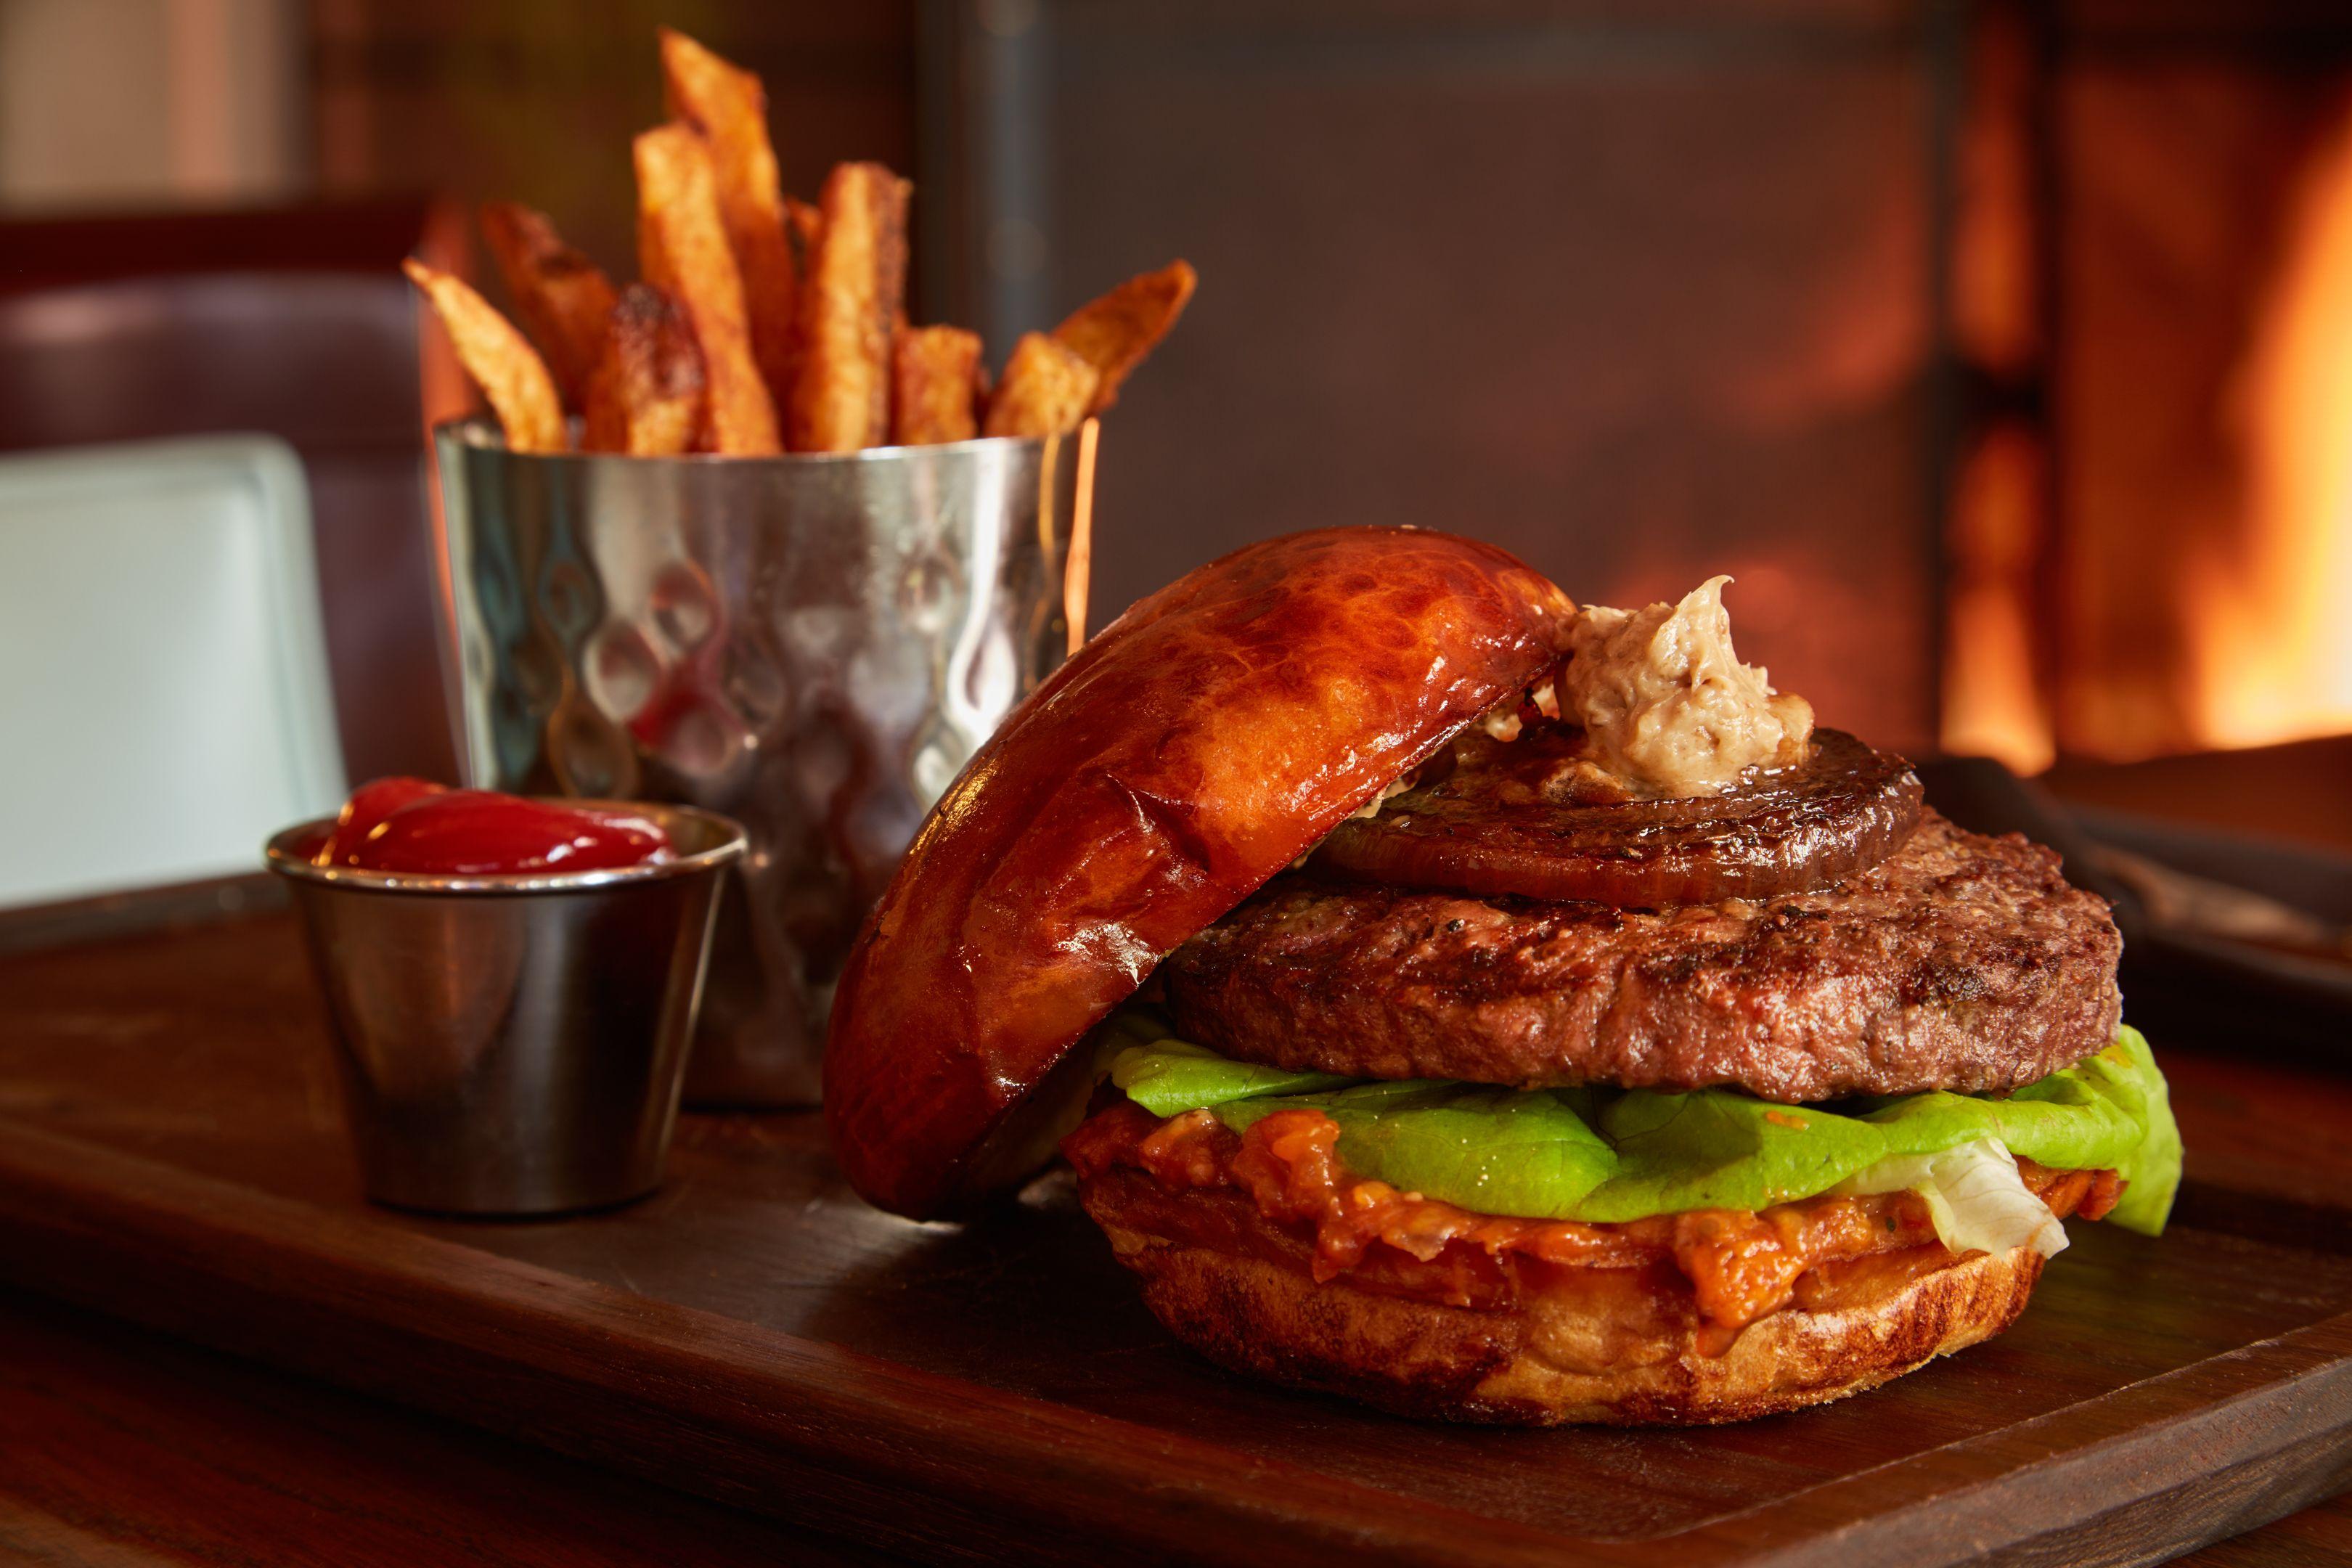 Burger0336.jpg